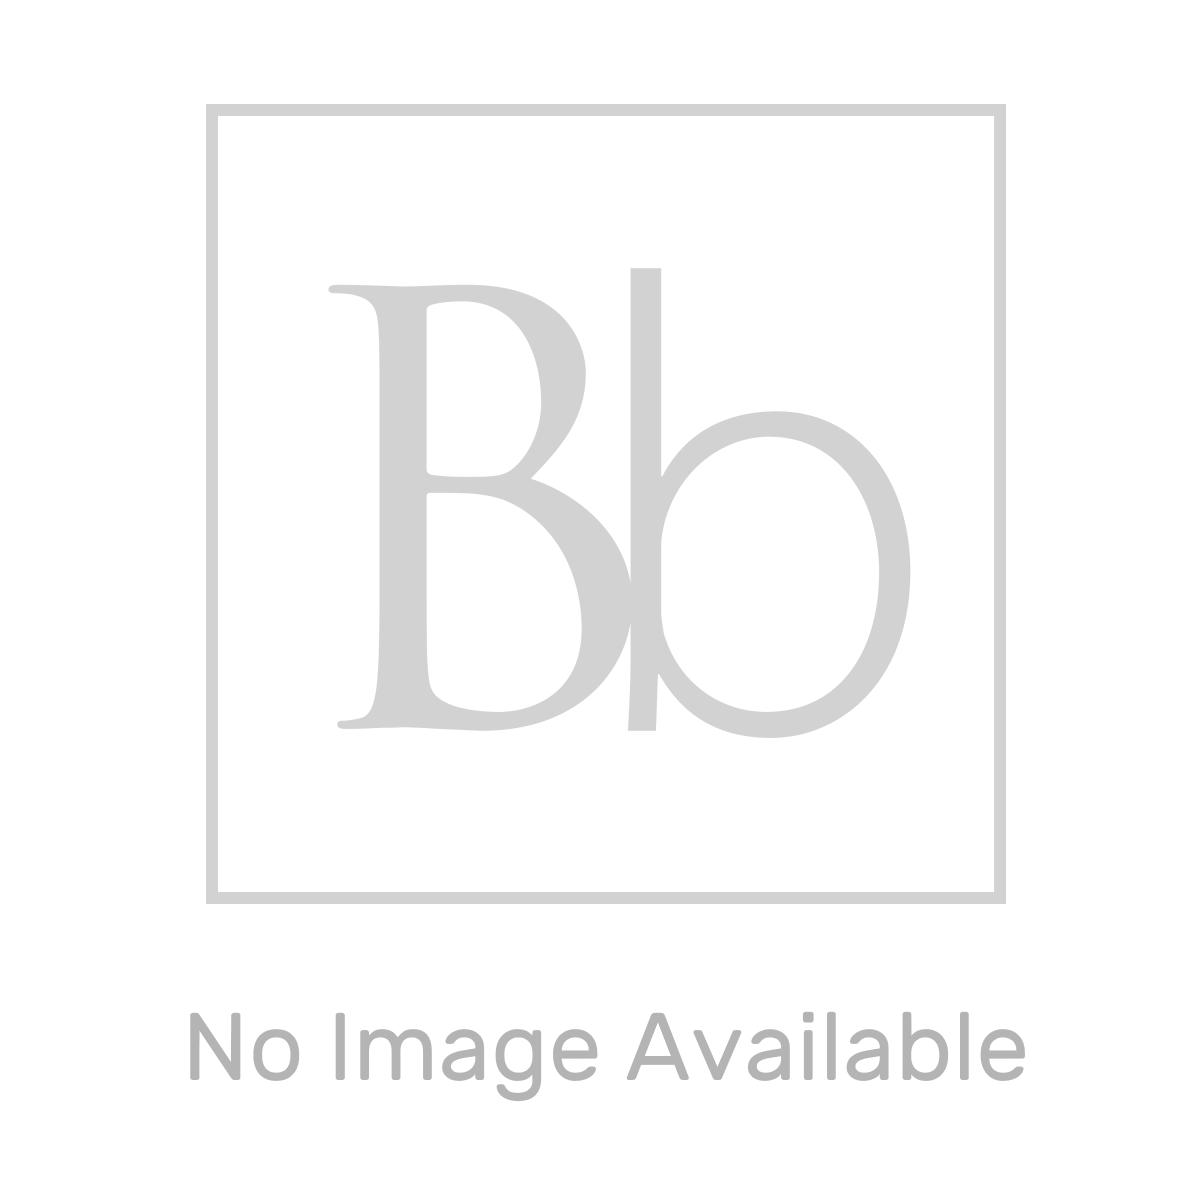 RAK Feeling Grey Rectangular Shower Tray 1600 x 800mm Measurements